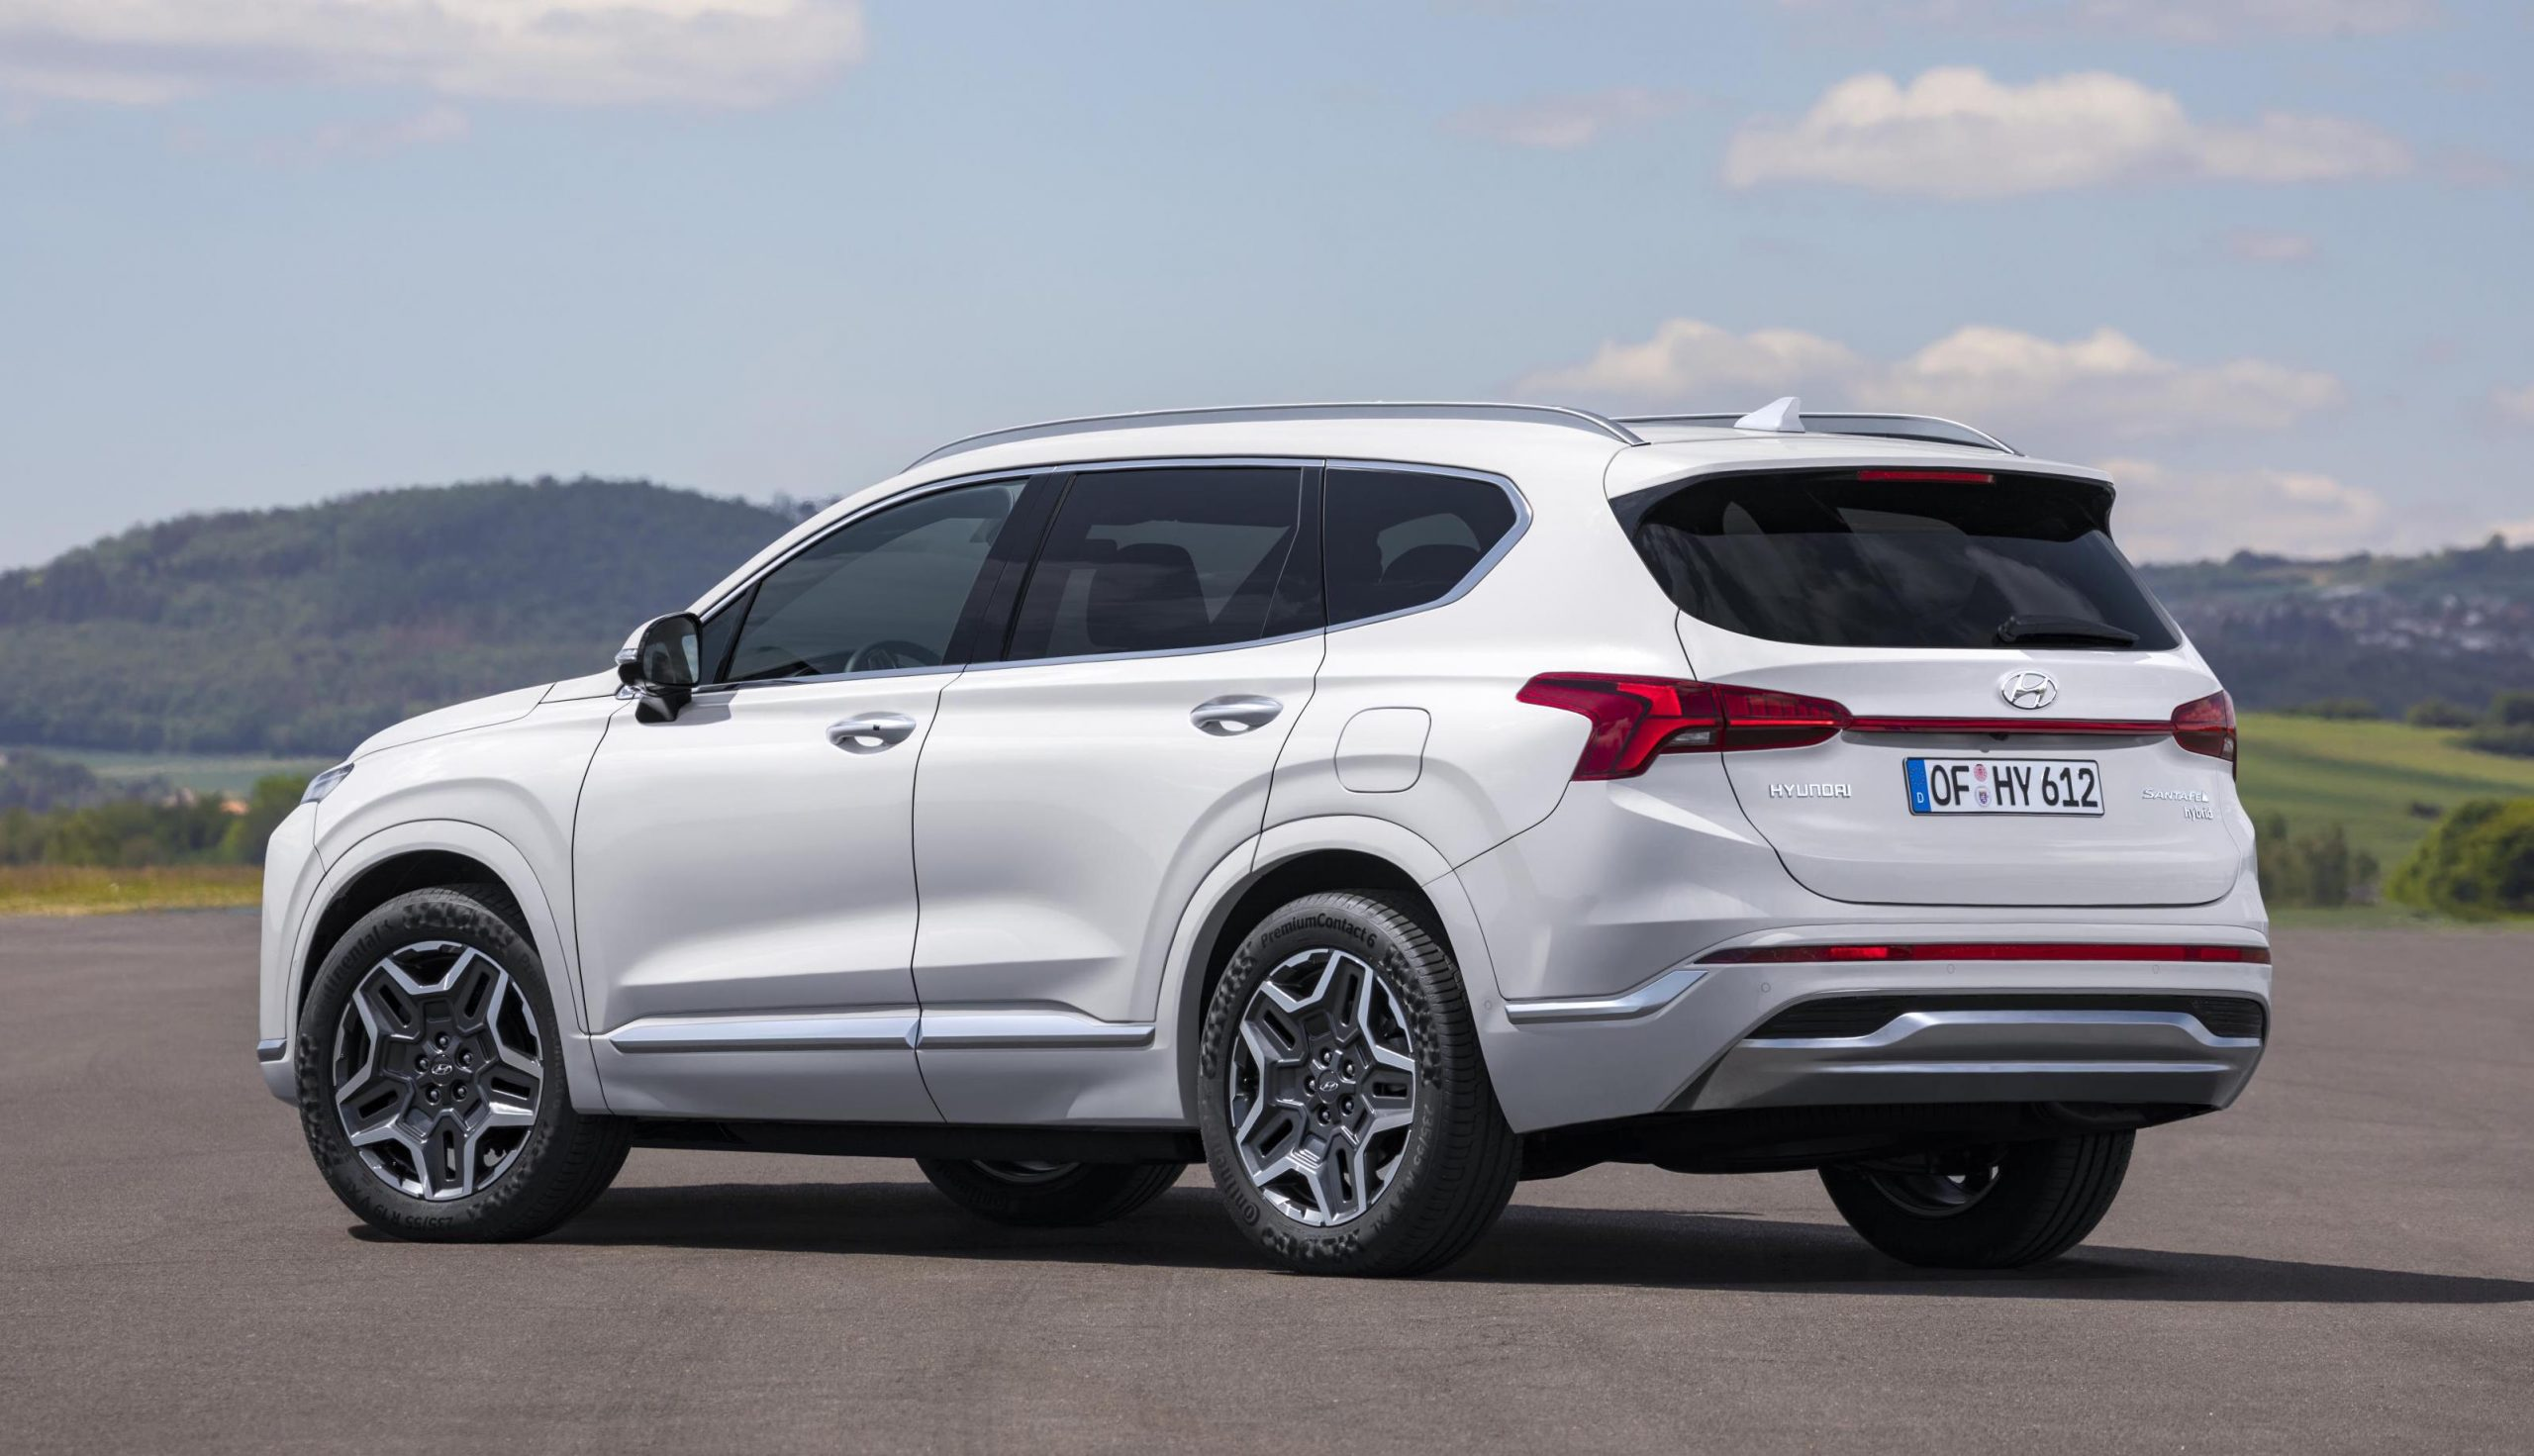 New-look 2021 Hyundai Santa Fe revealed | PerformanceDrive